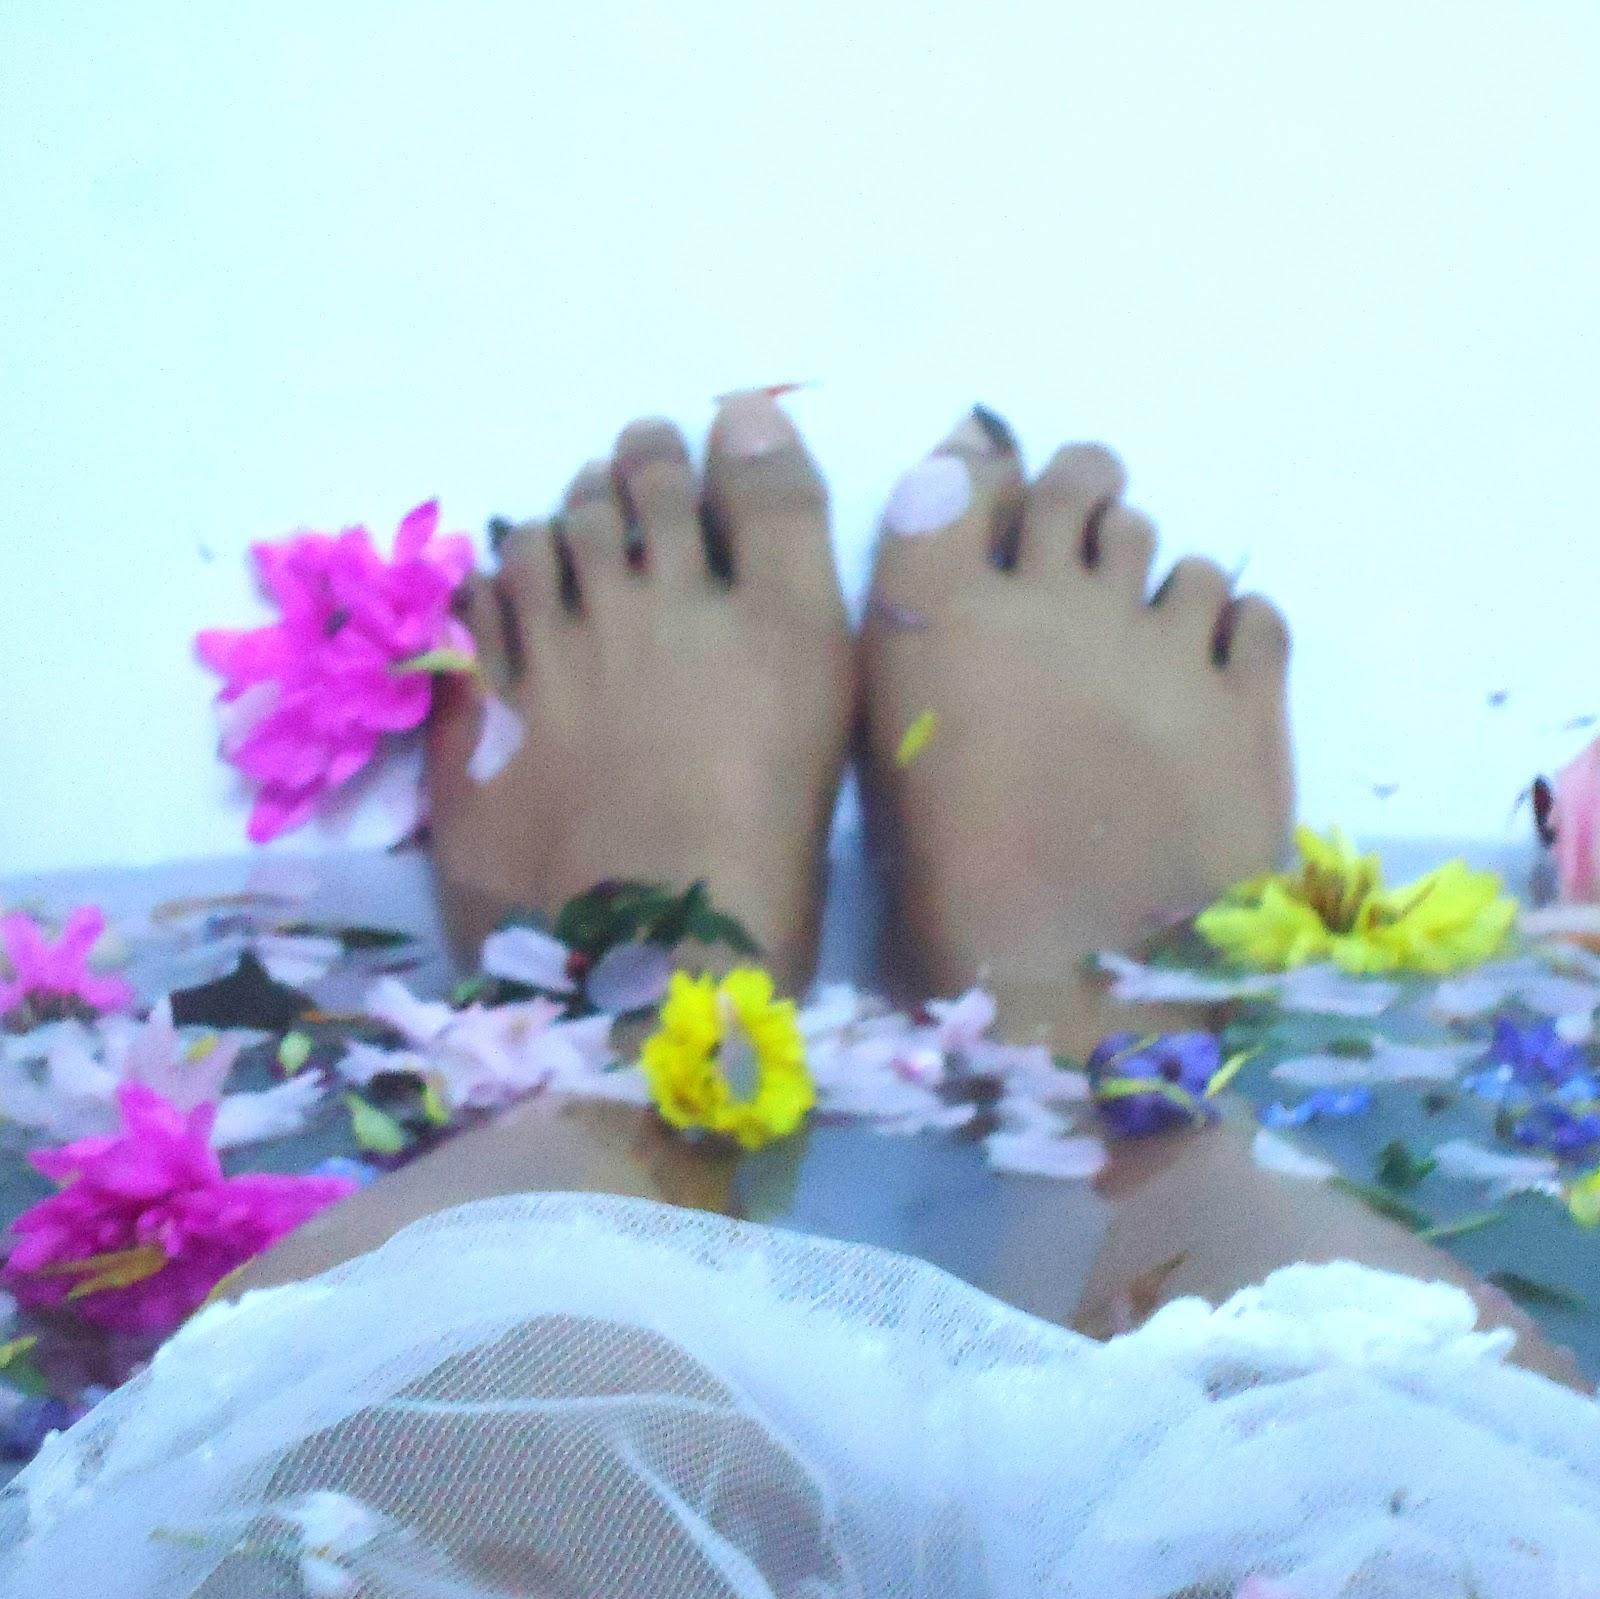 http://pridenstyle.blogspot.co.uk/2014/04/oriental-floral-fantasy.html